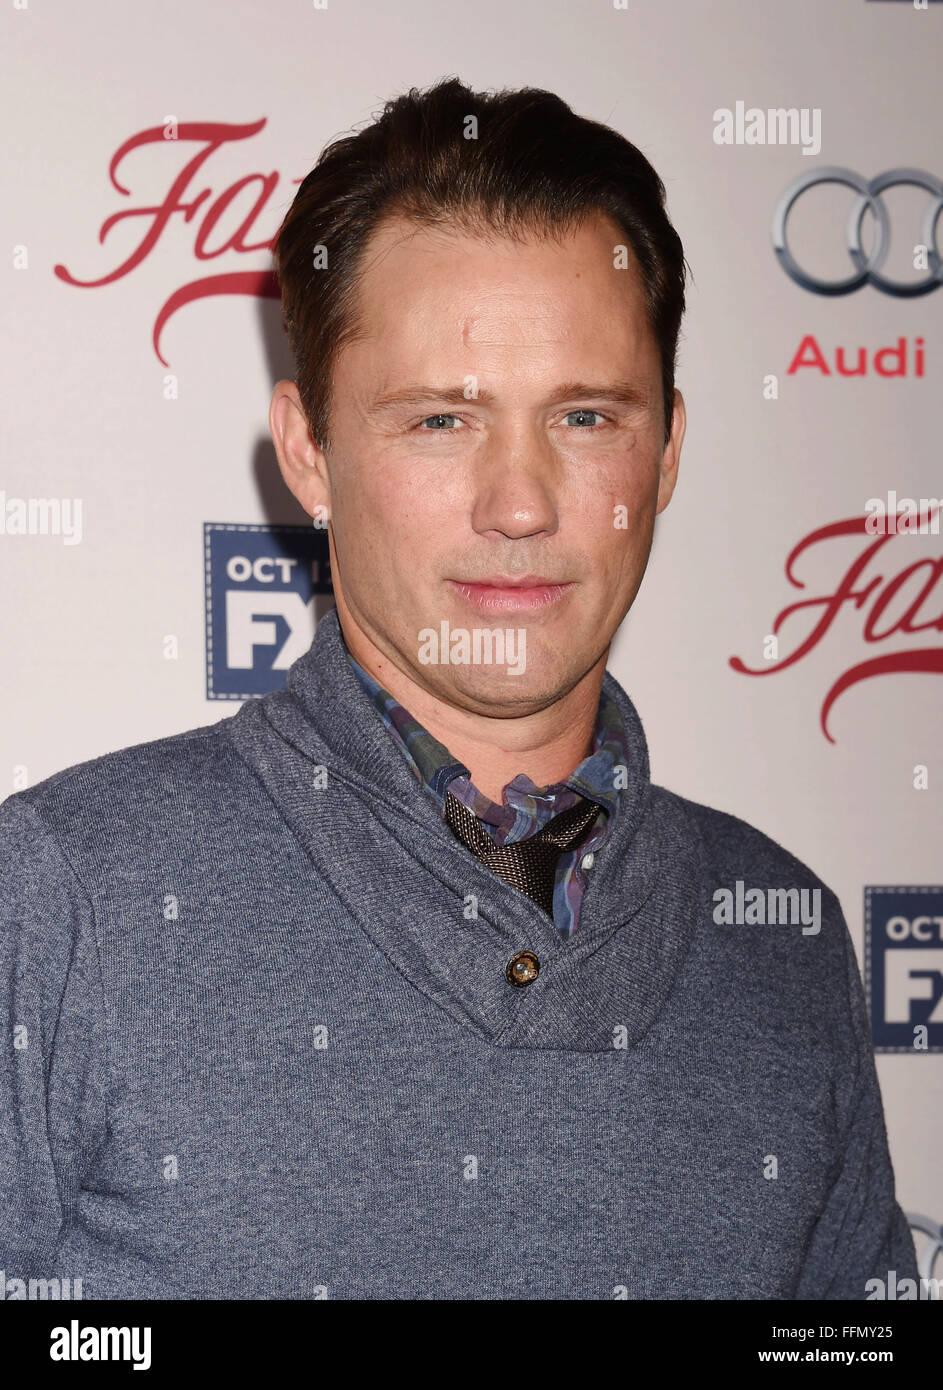 Actor Jeffrey Donovan attends the premiere of FX's 'Fargo' Season 2 held at ArcLight Cinemas on October - Stock Image